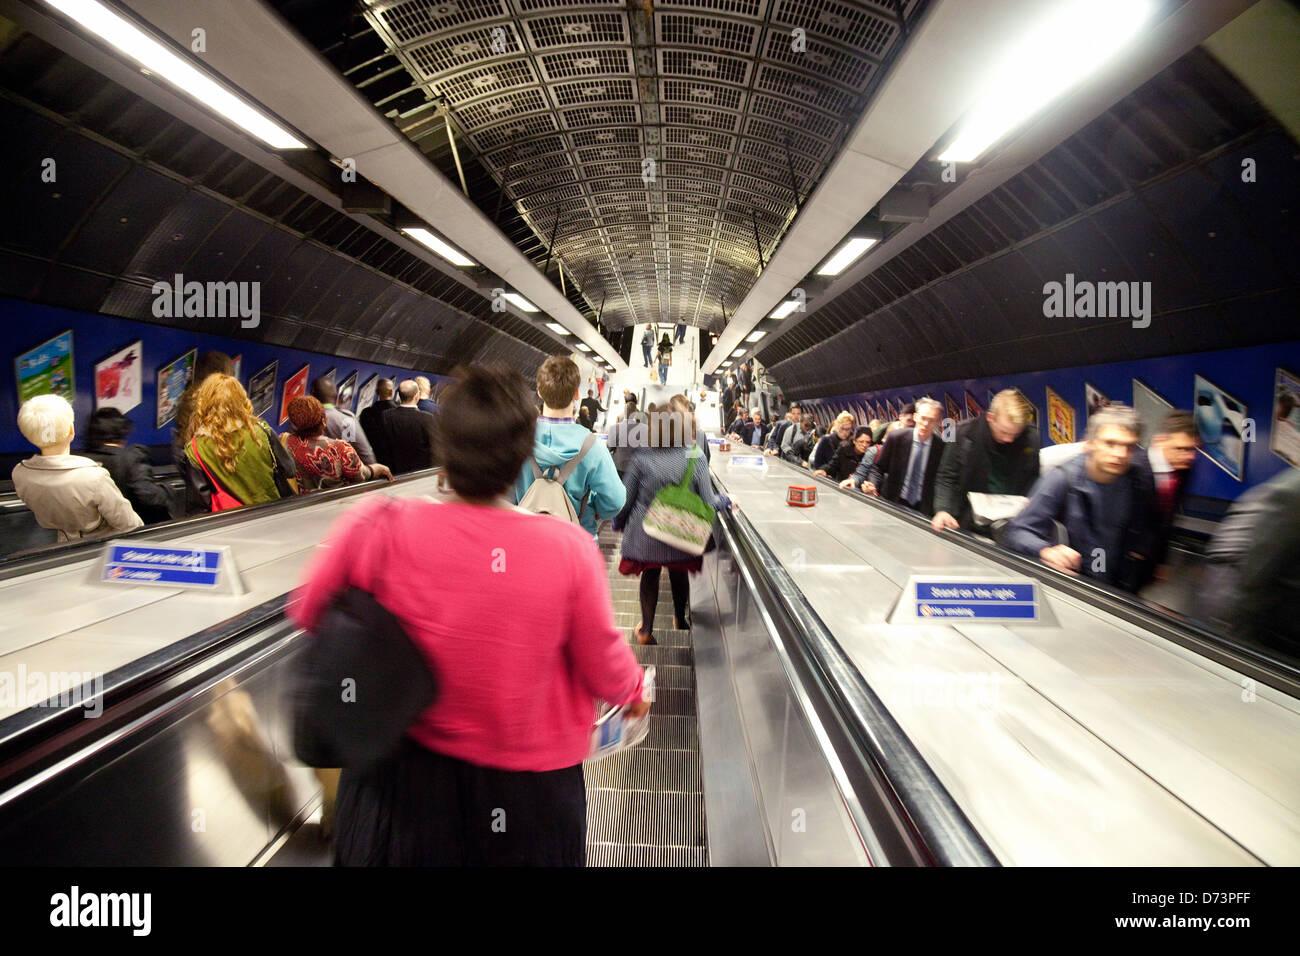 commuters commuting to work on escalators, the London Underground subway, London Bridge station, UK - Stock Image